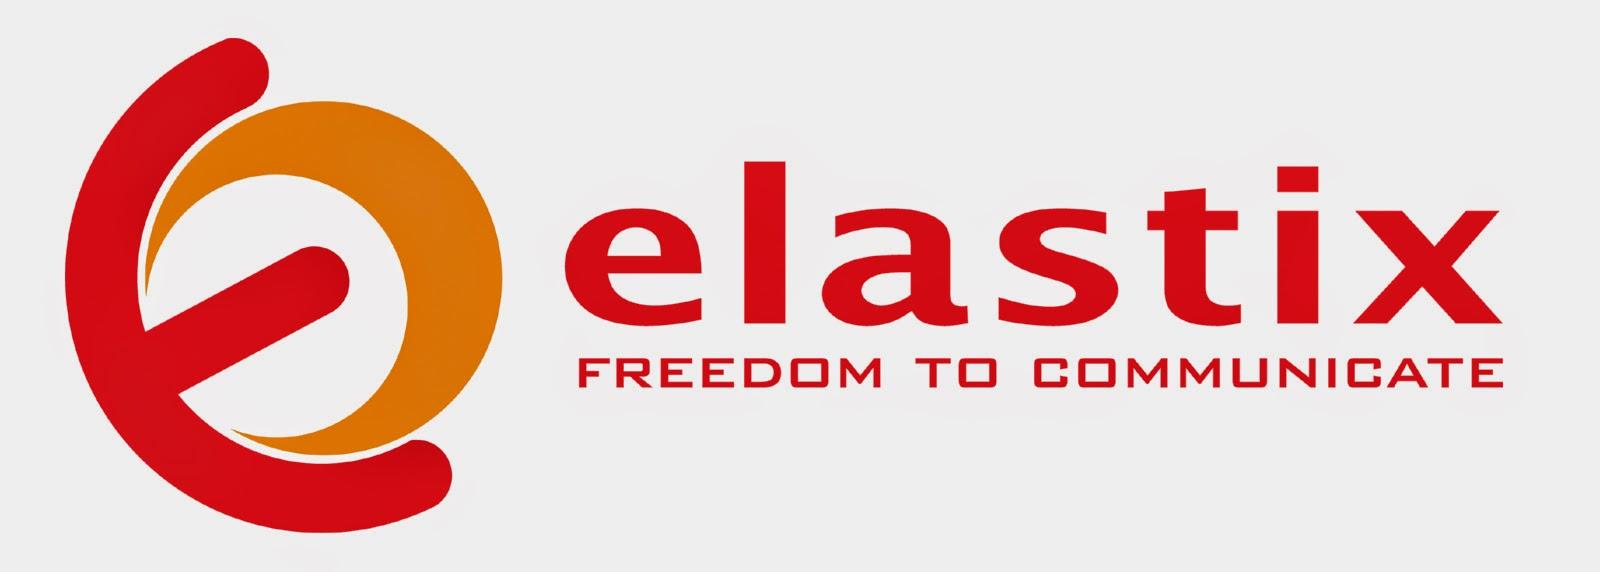 DriveMeca Elastix logo